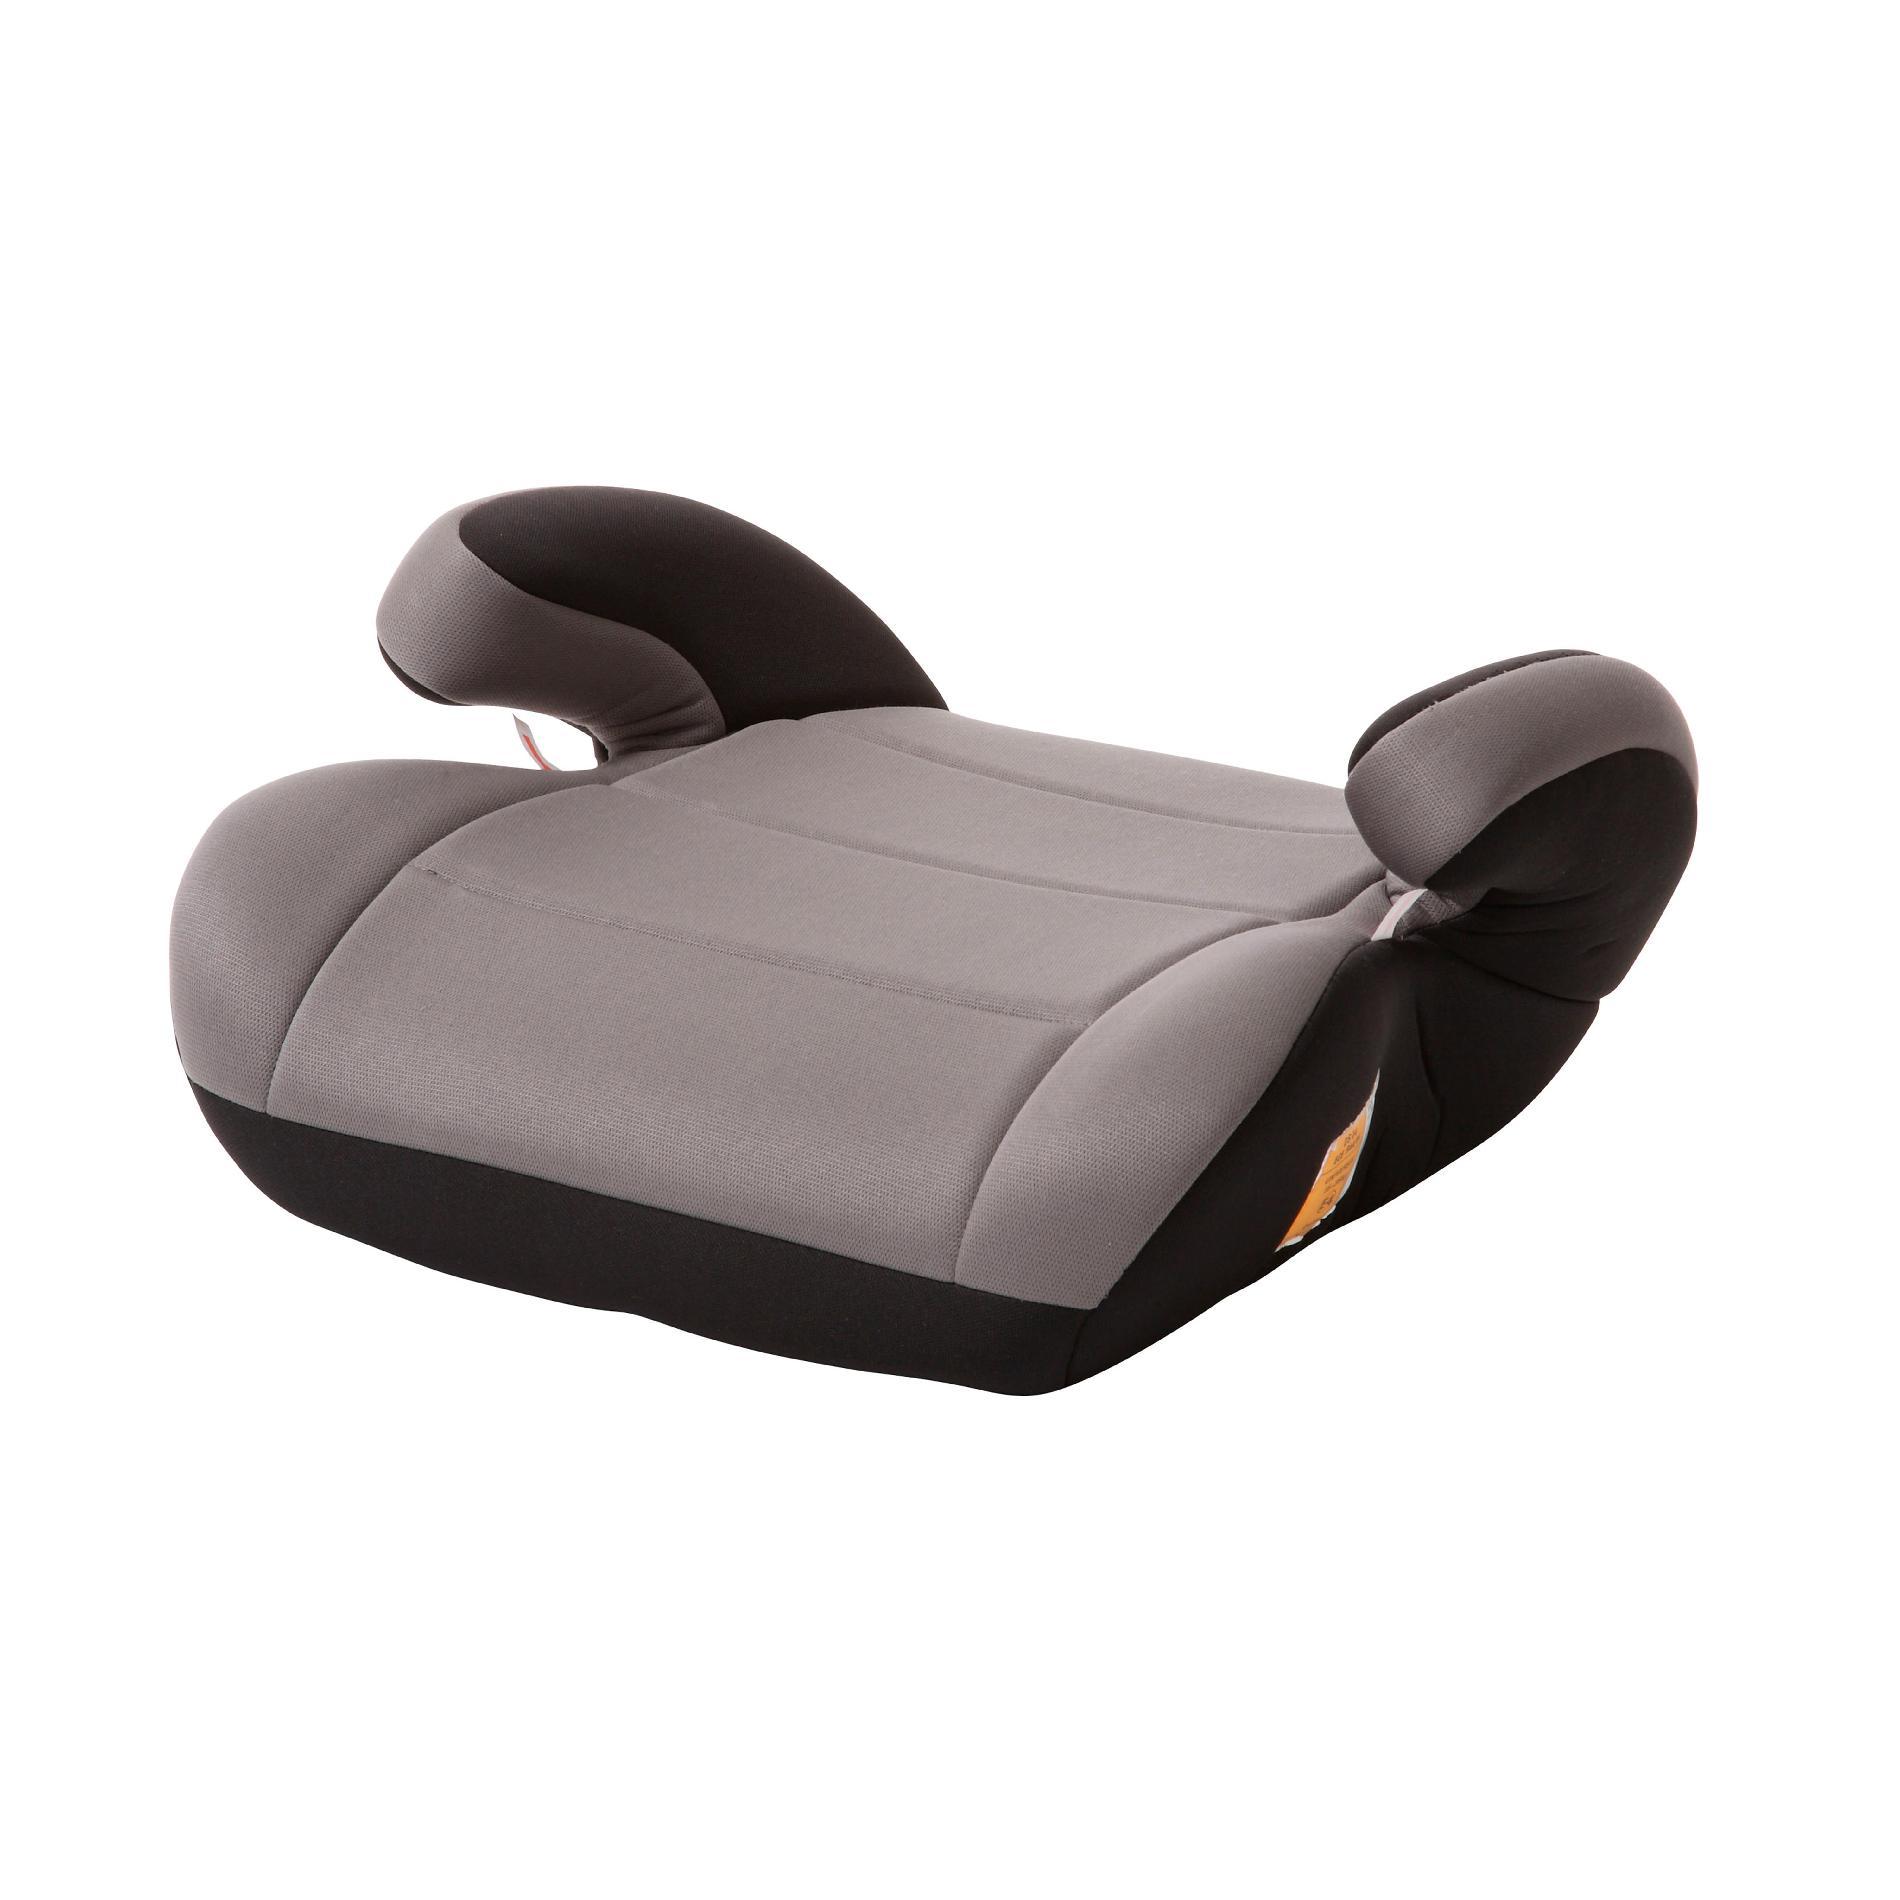 dorel juvenile group high chair grey velvet dining chairs uk cosco car seat usa